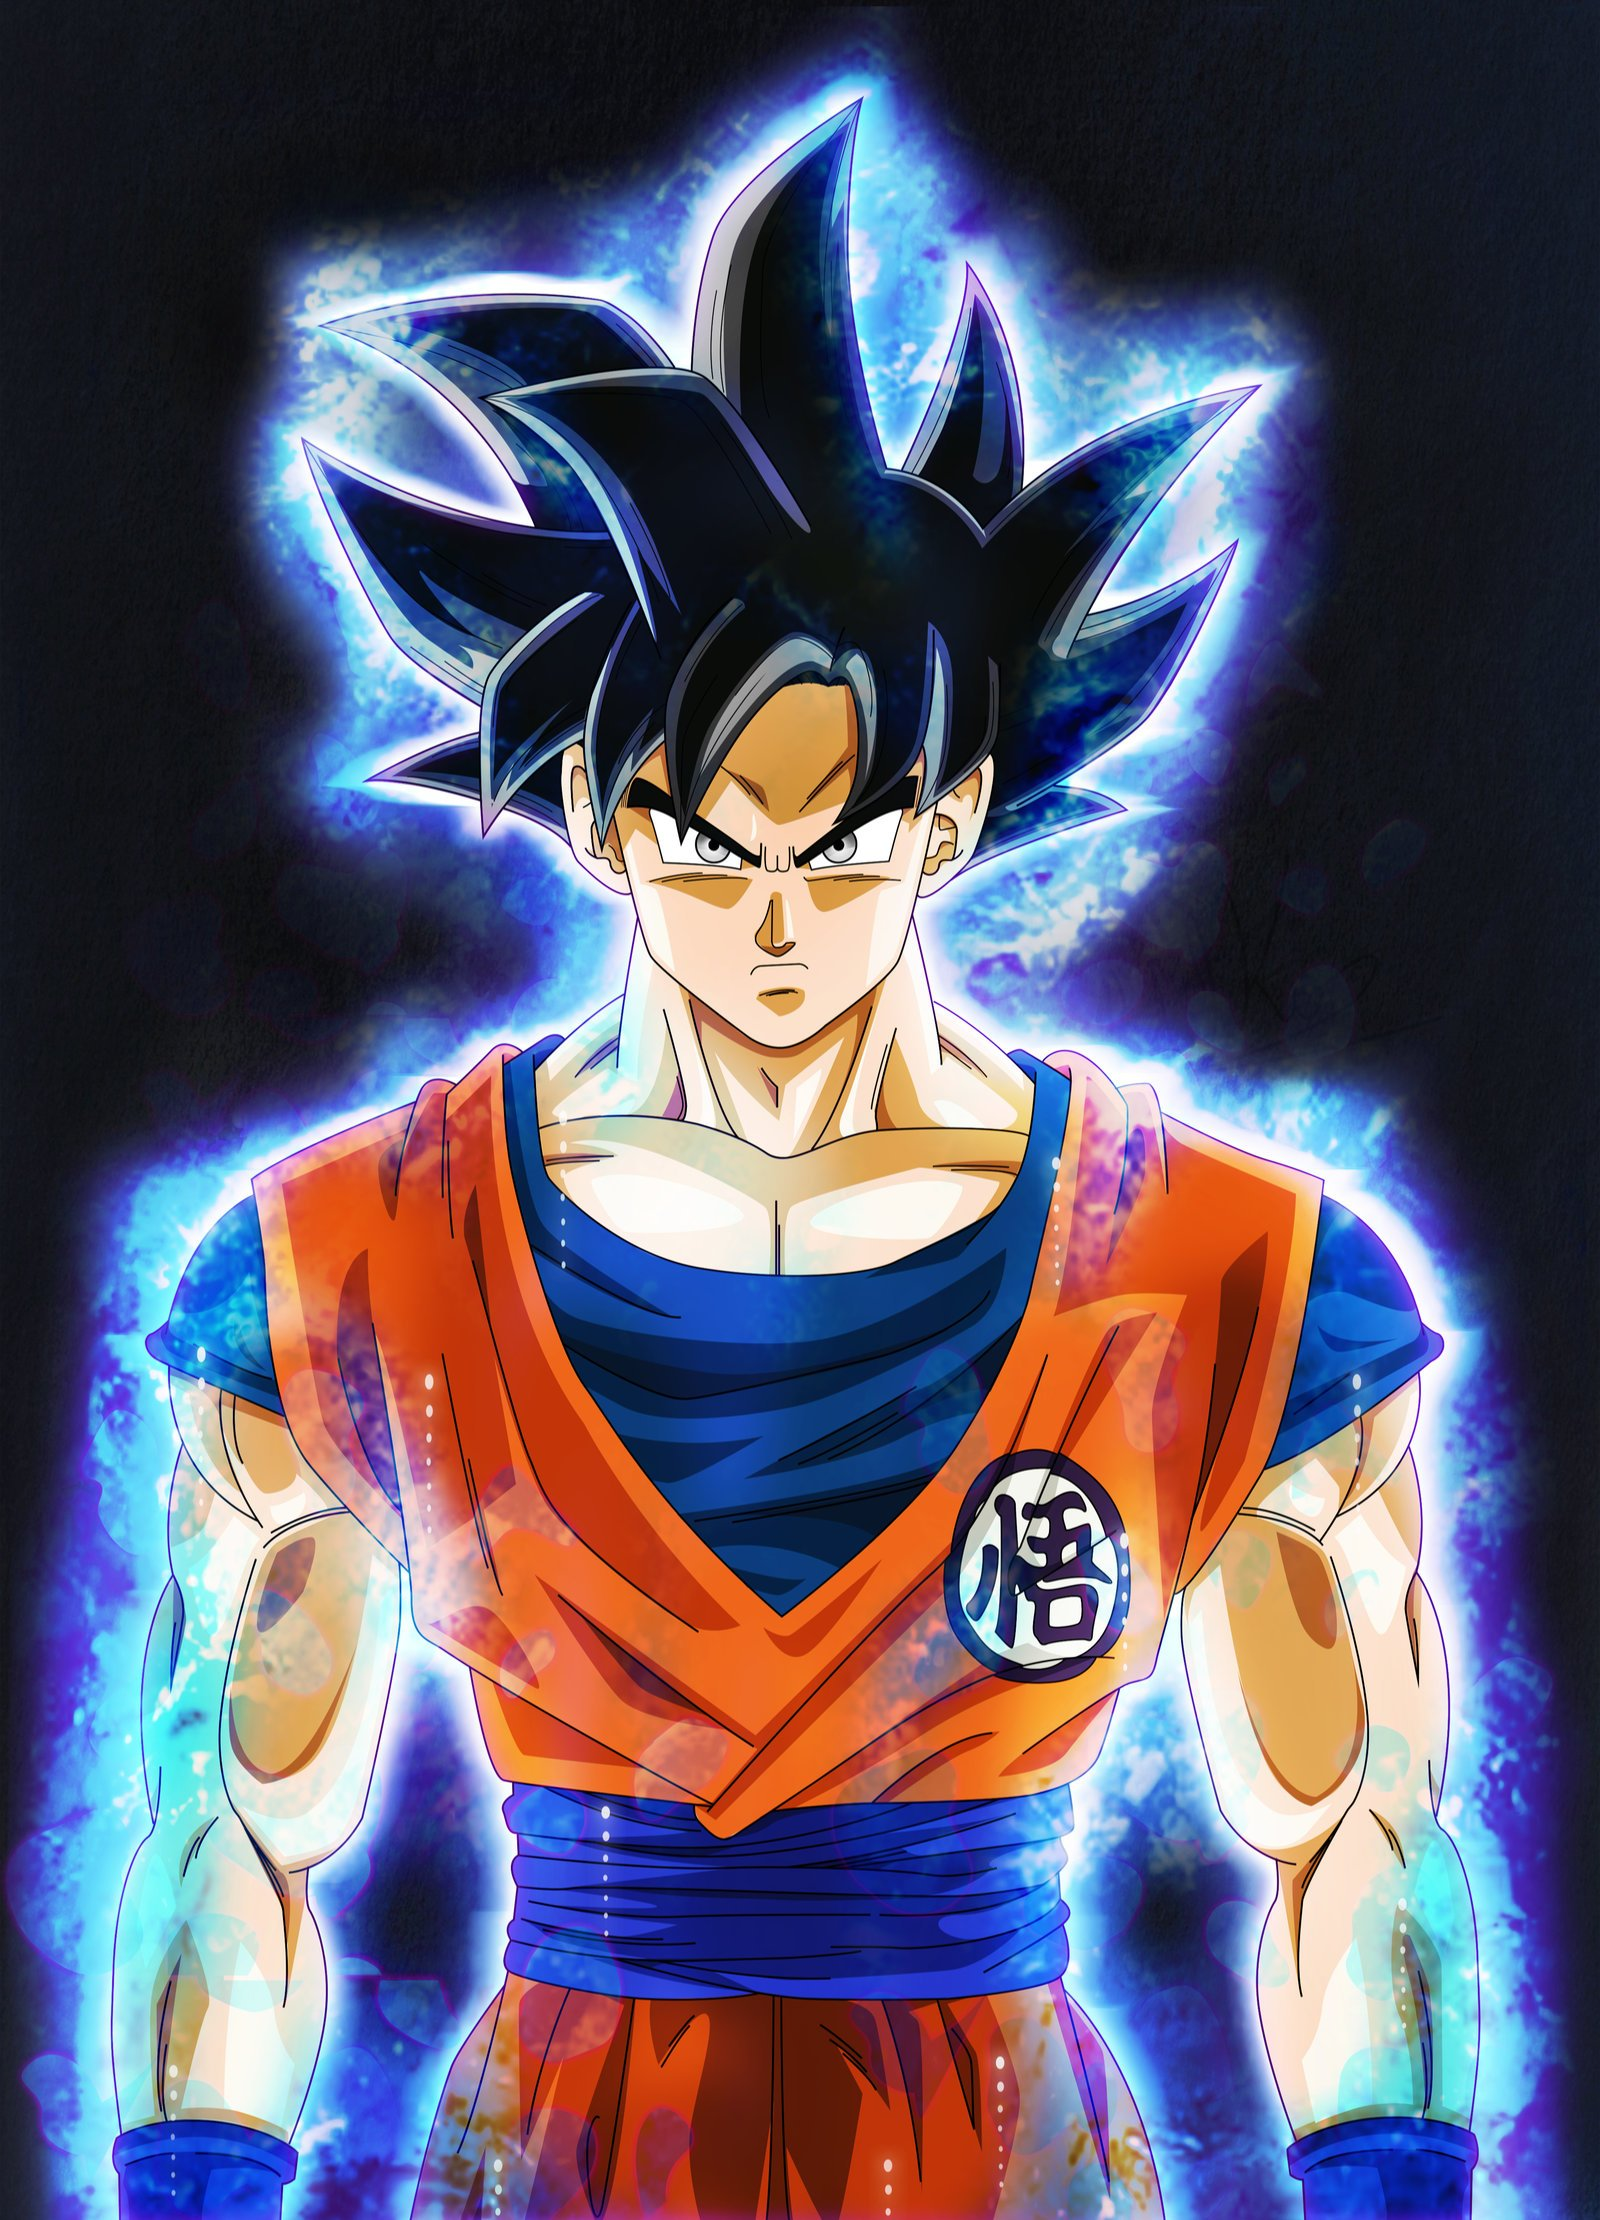 Dbs Ultra Instinct Goku Wallpaper WallsKid 1600x2220